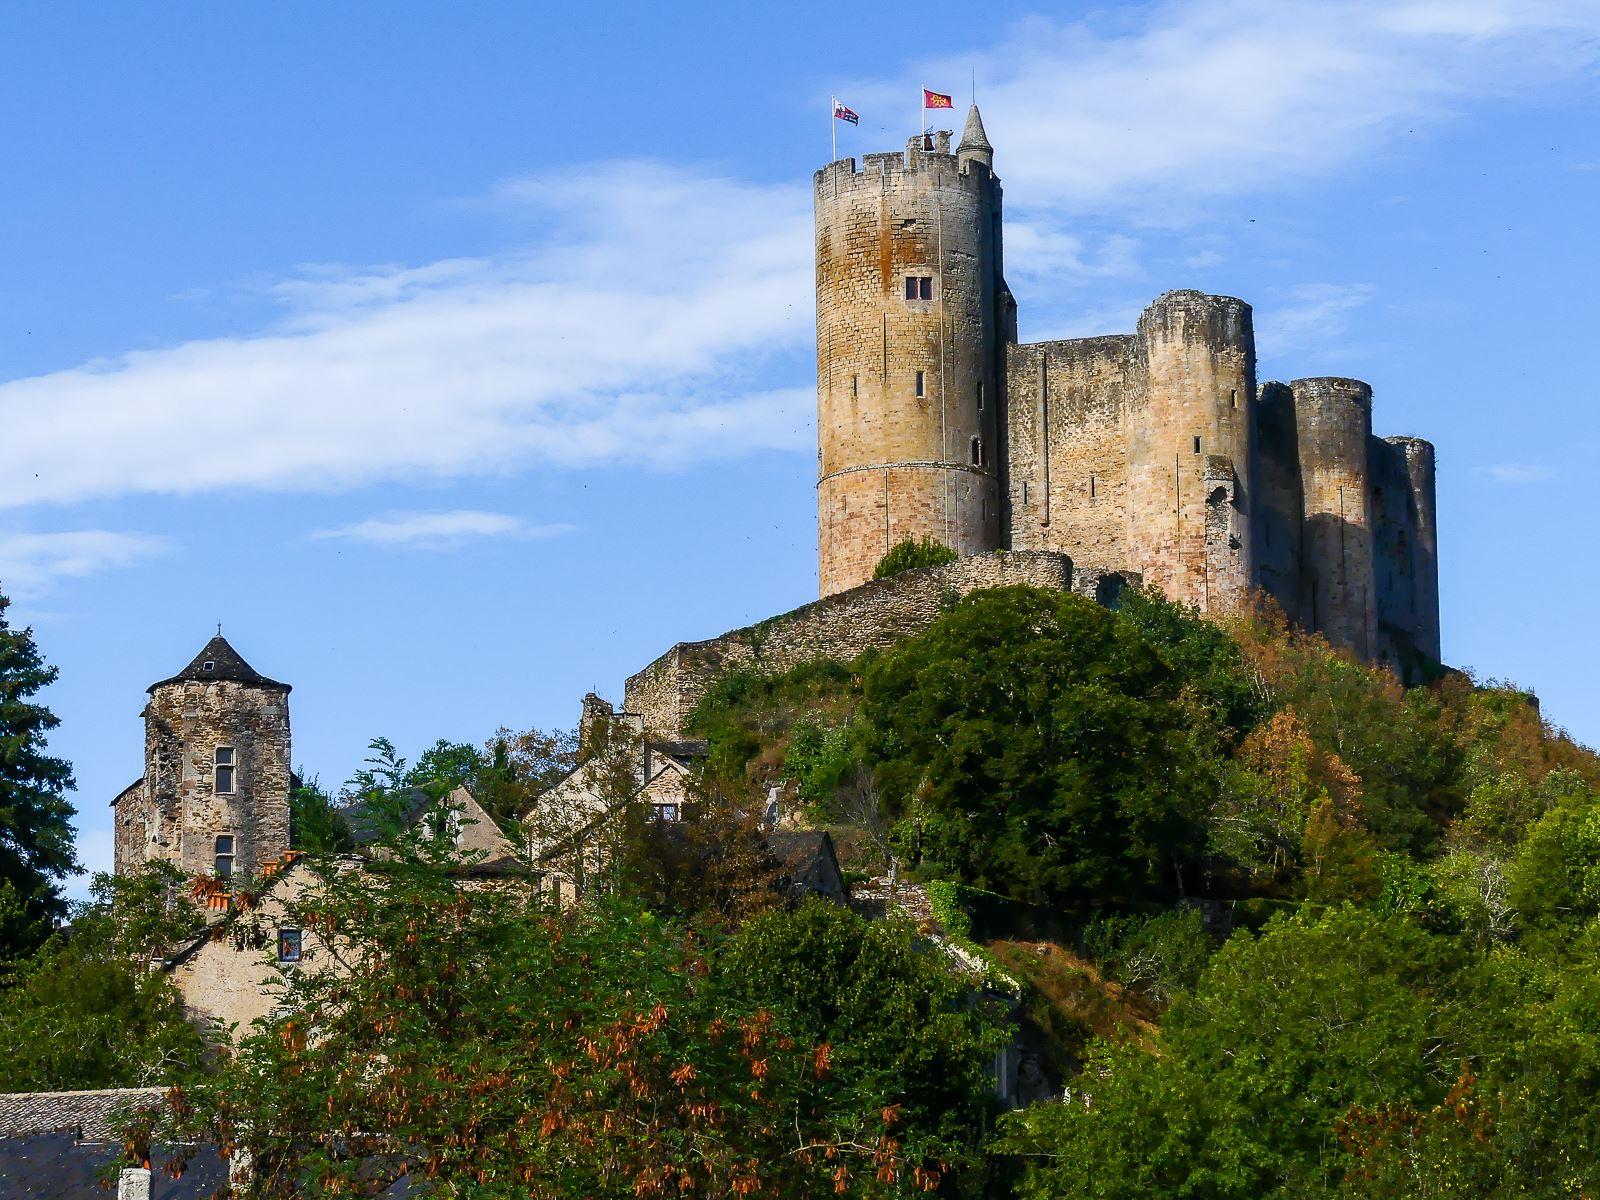 La forteresse de Najac